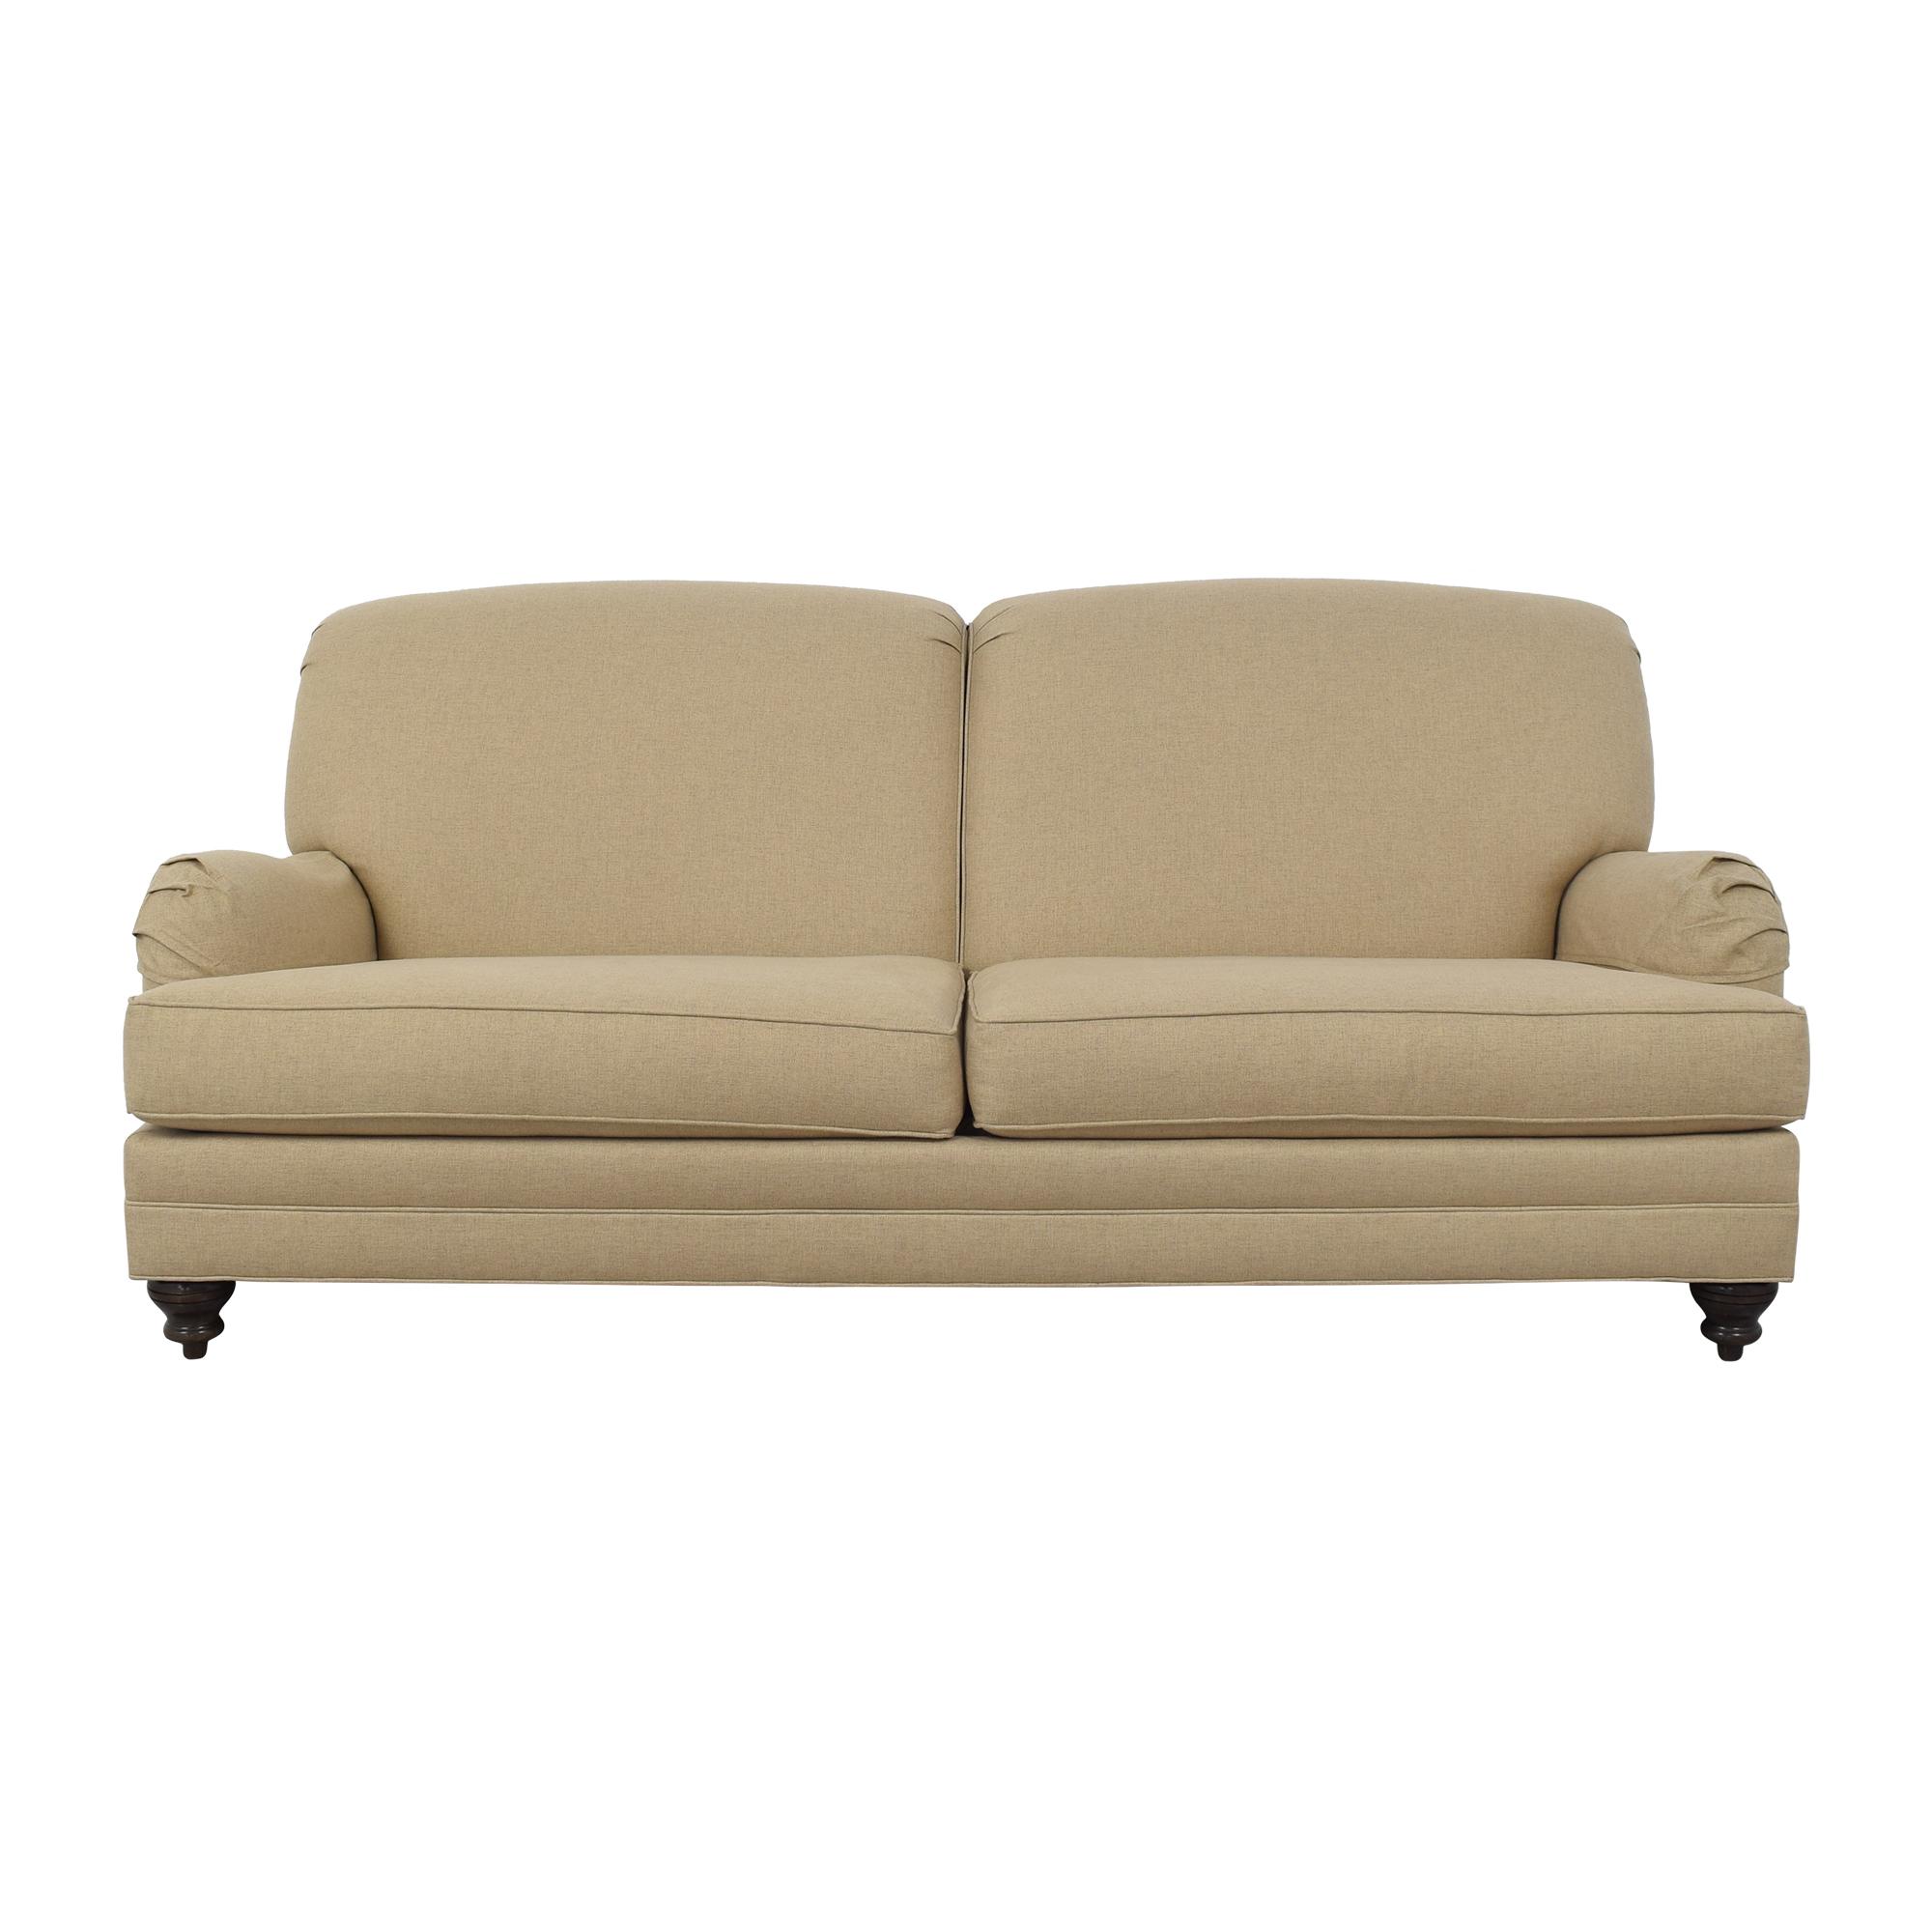 Ethan Allen Madison Sofa / Classic Sofas